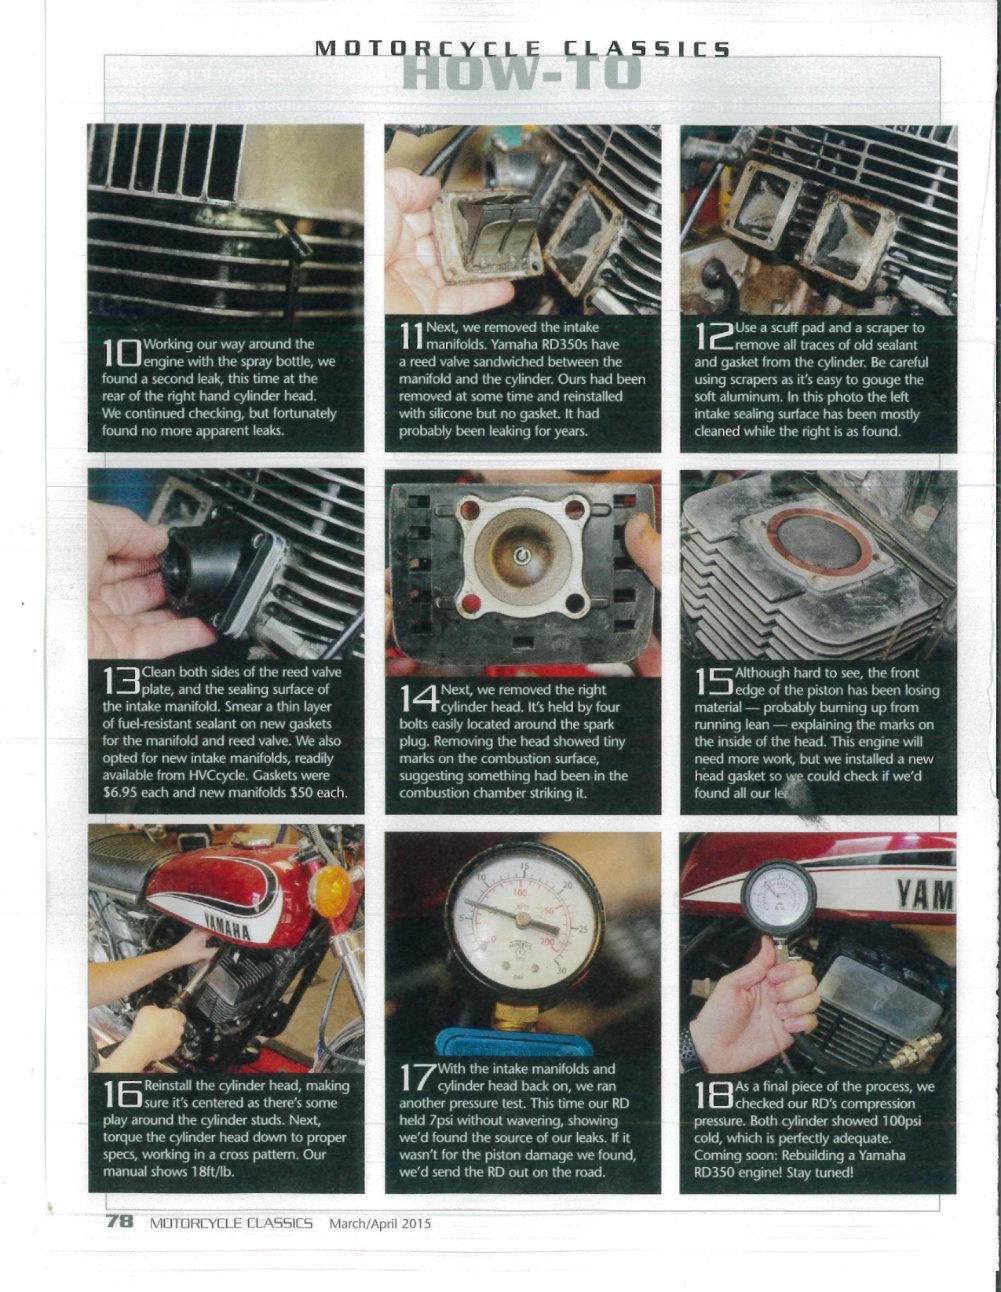 rd350-pressure-check-page-003.jpg